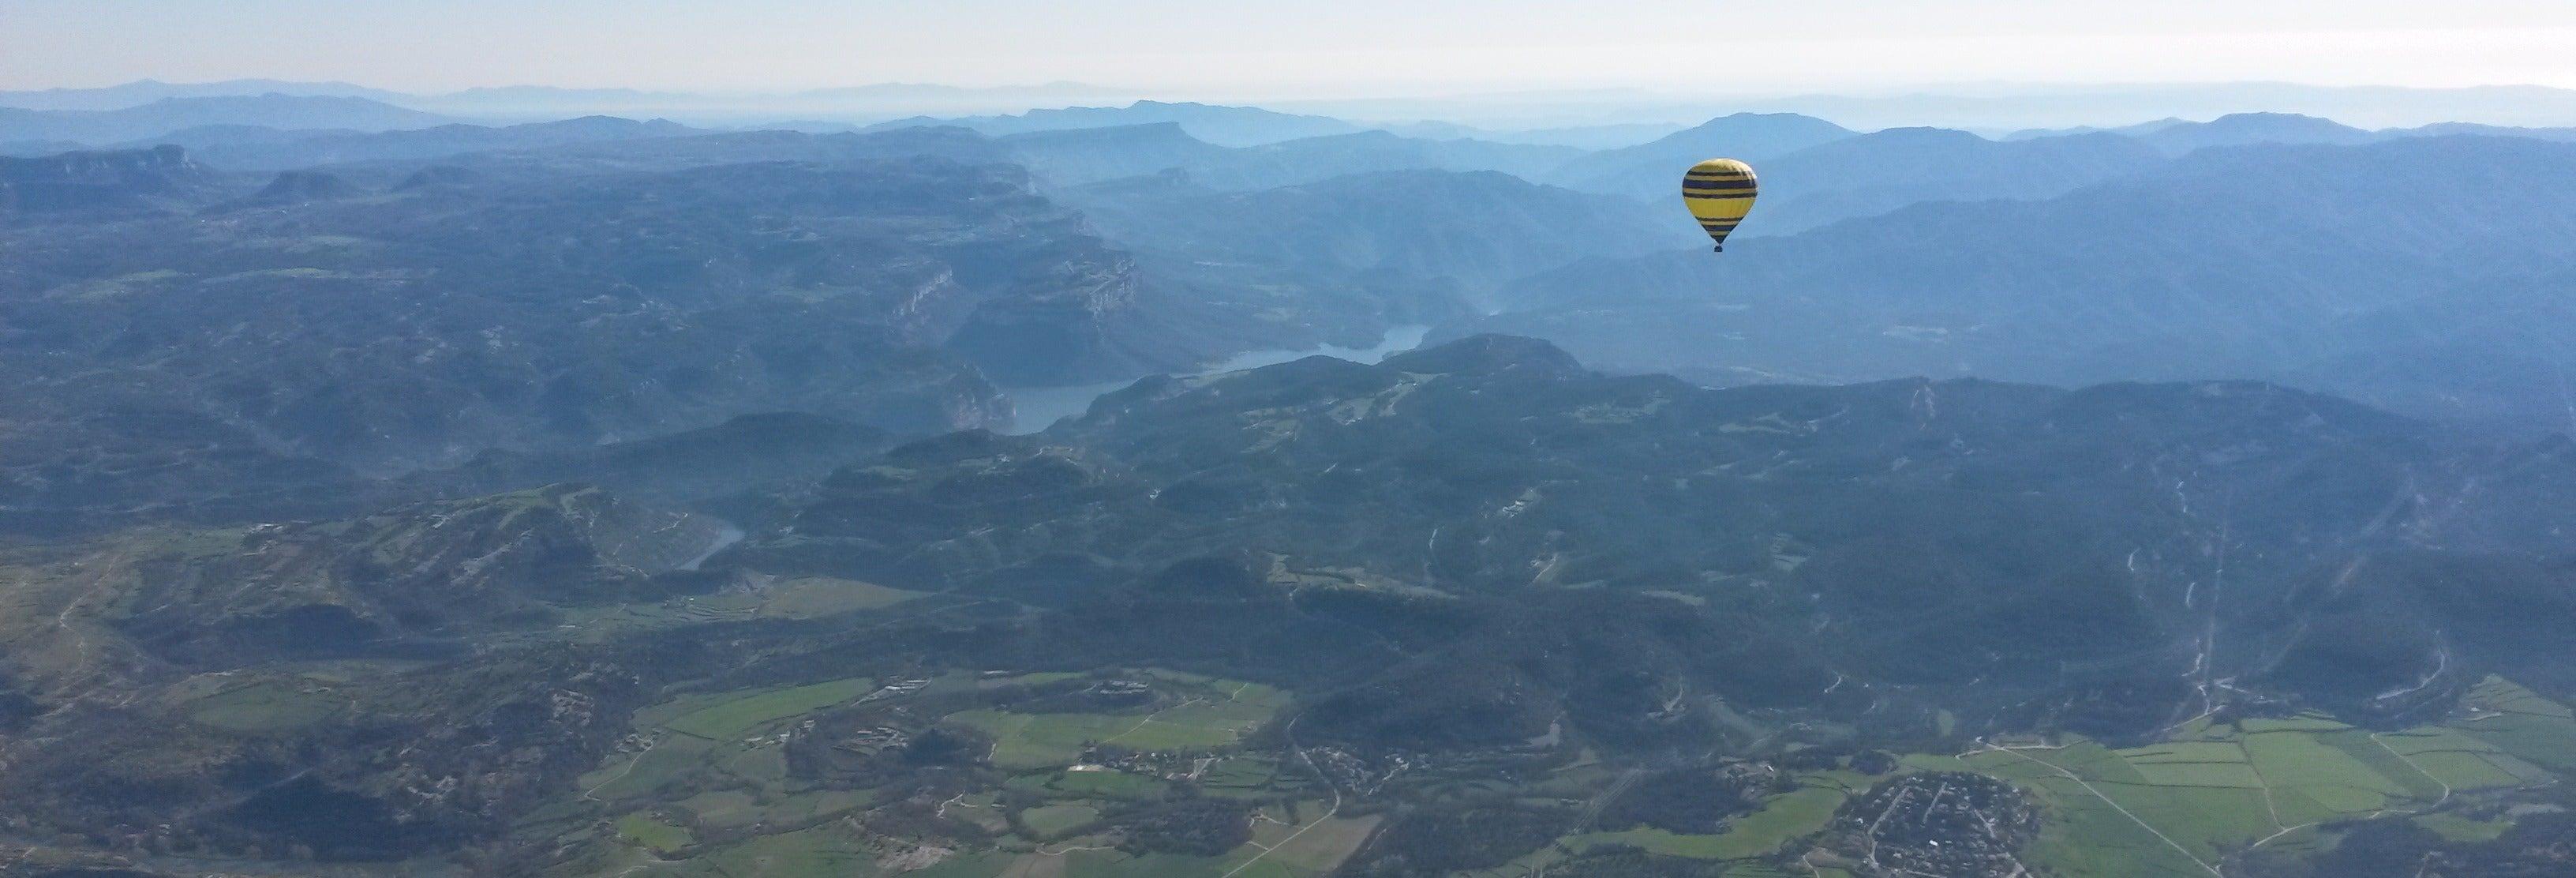 National Park Hot Air Balloon Ride